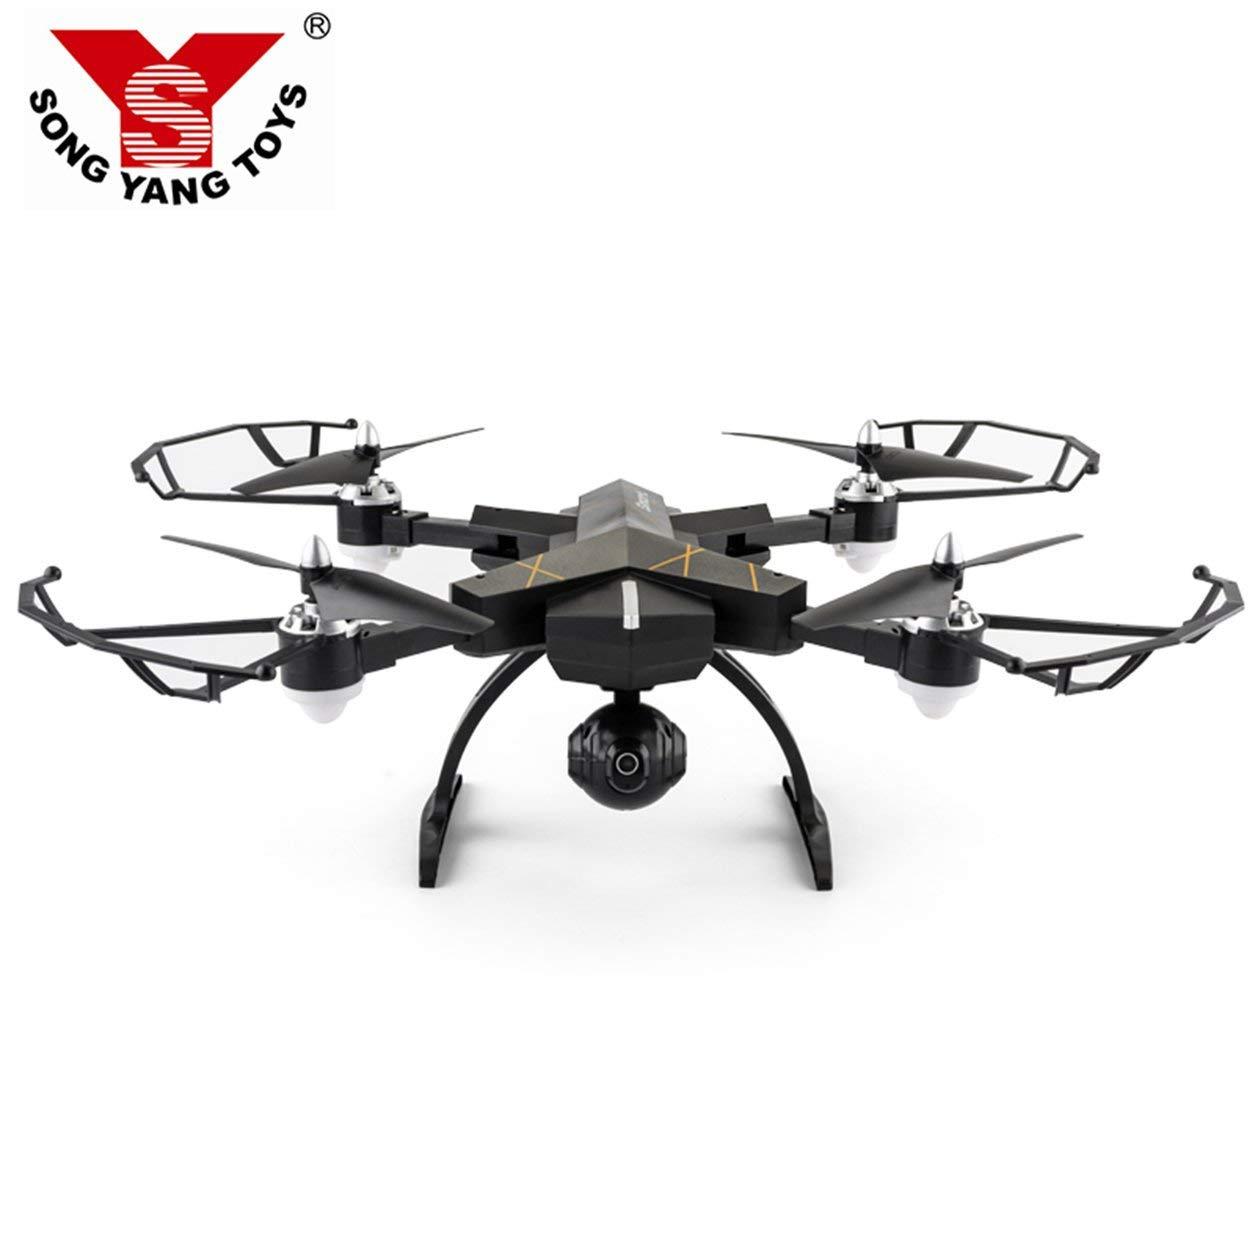 Dailyinshop X38-1 720P Folding verformter WiFi Headless Modus Altitude Hold RC Quadcopter